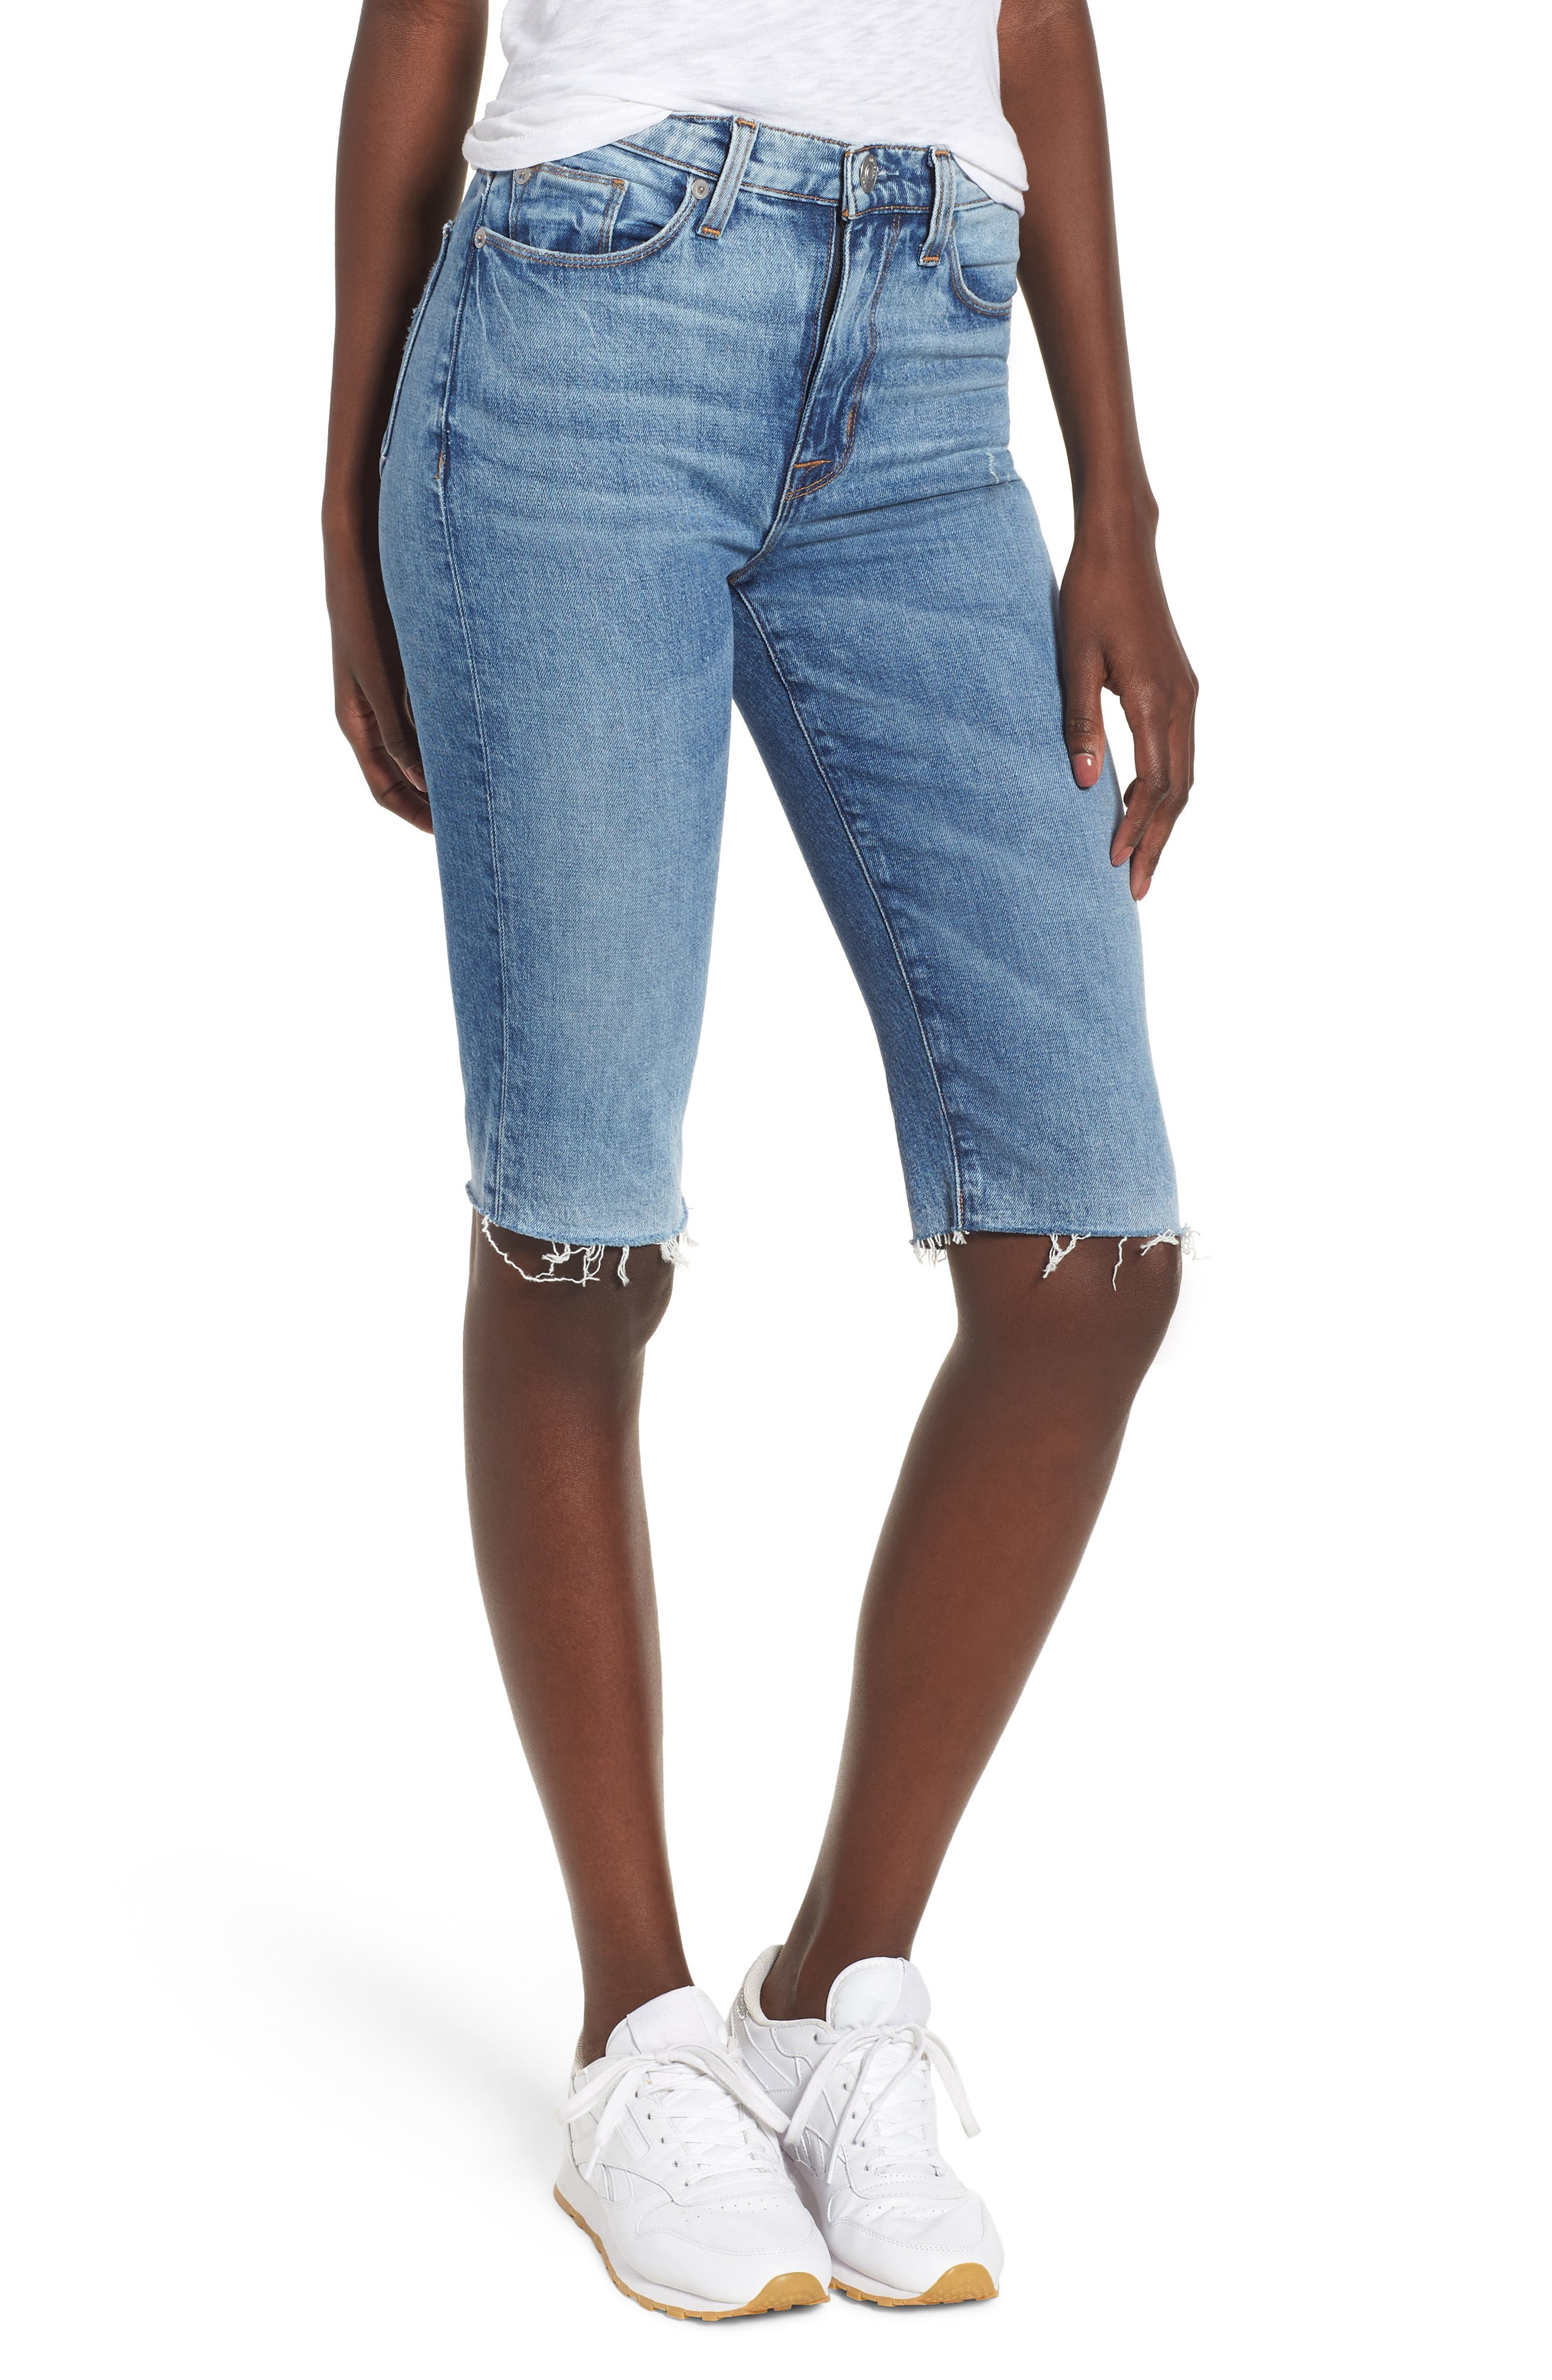 Zoeey High Waist Cutoff Boyfriend Shorts,                         Main,                         color, JUST FOR KICKS